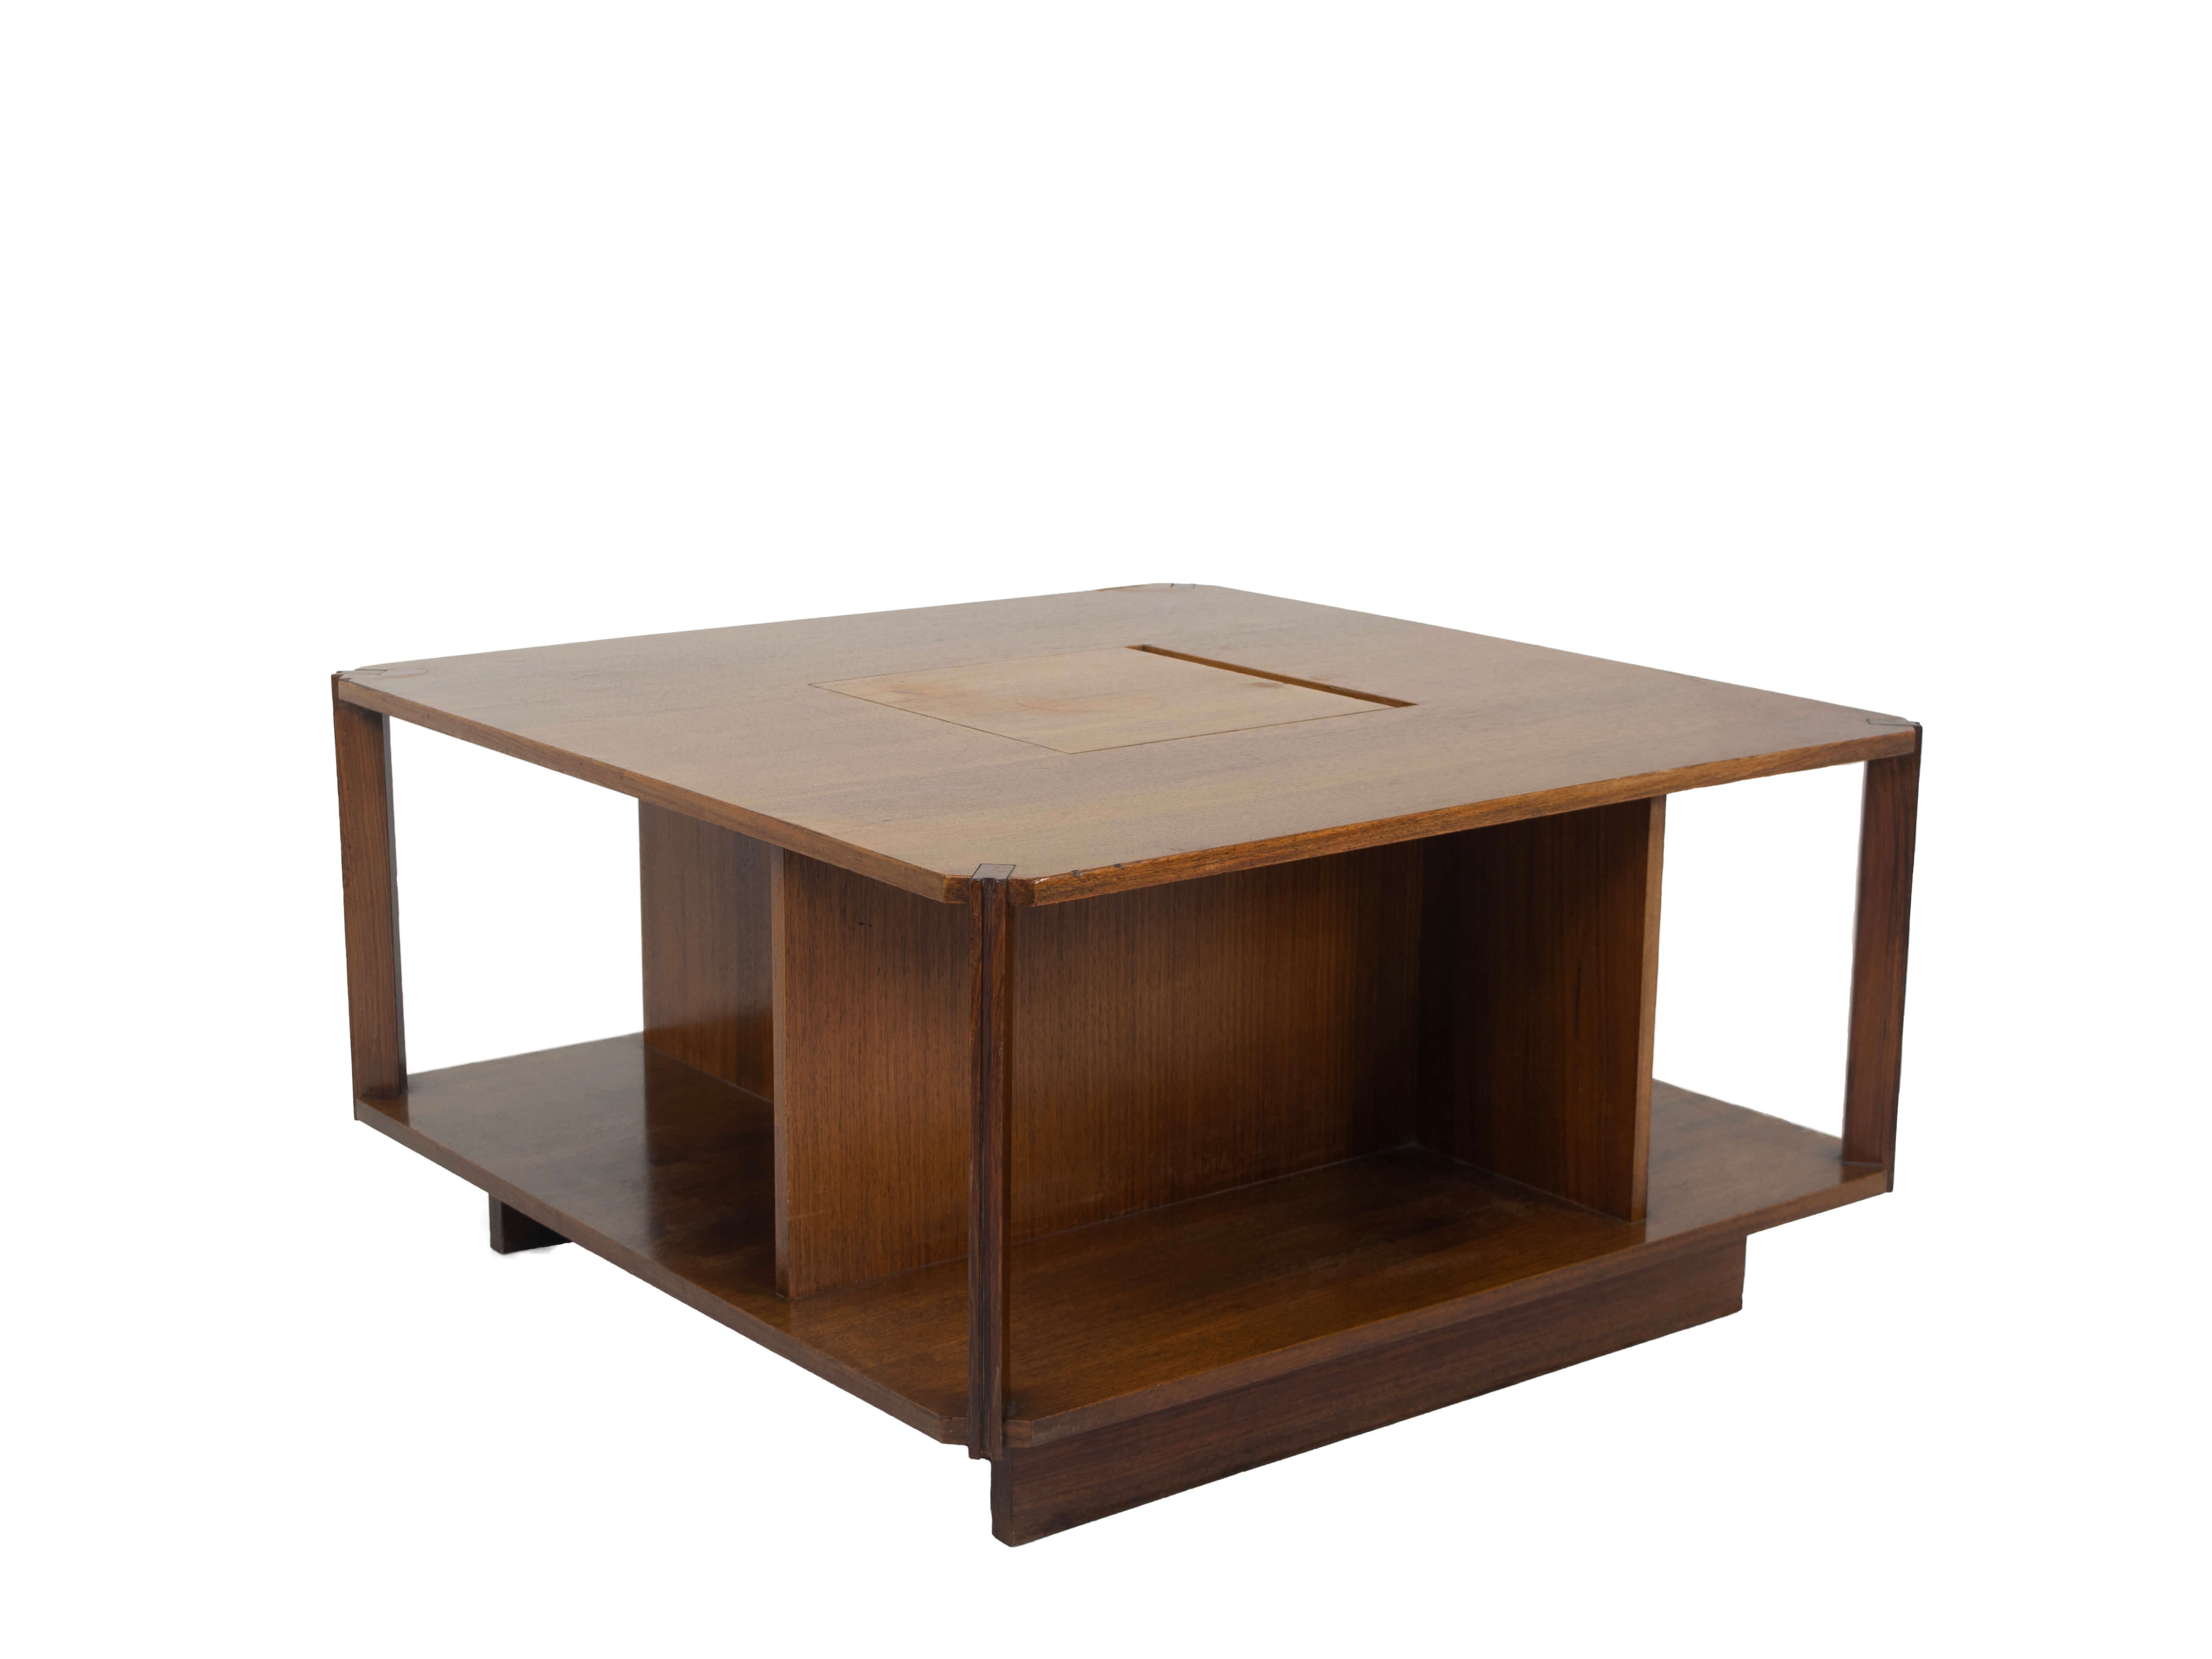 Marco Zanuso Square Bar Table for Arflex, Italy 1965